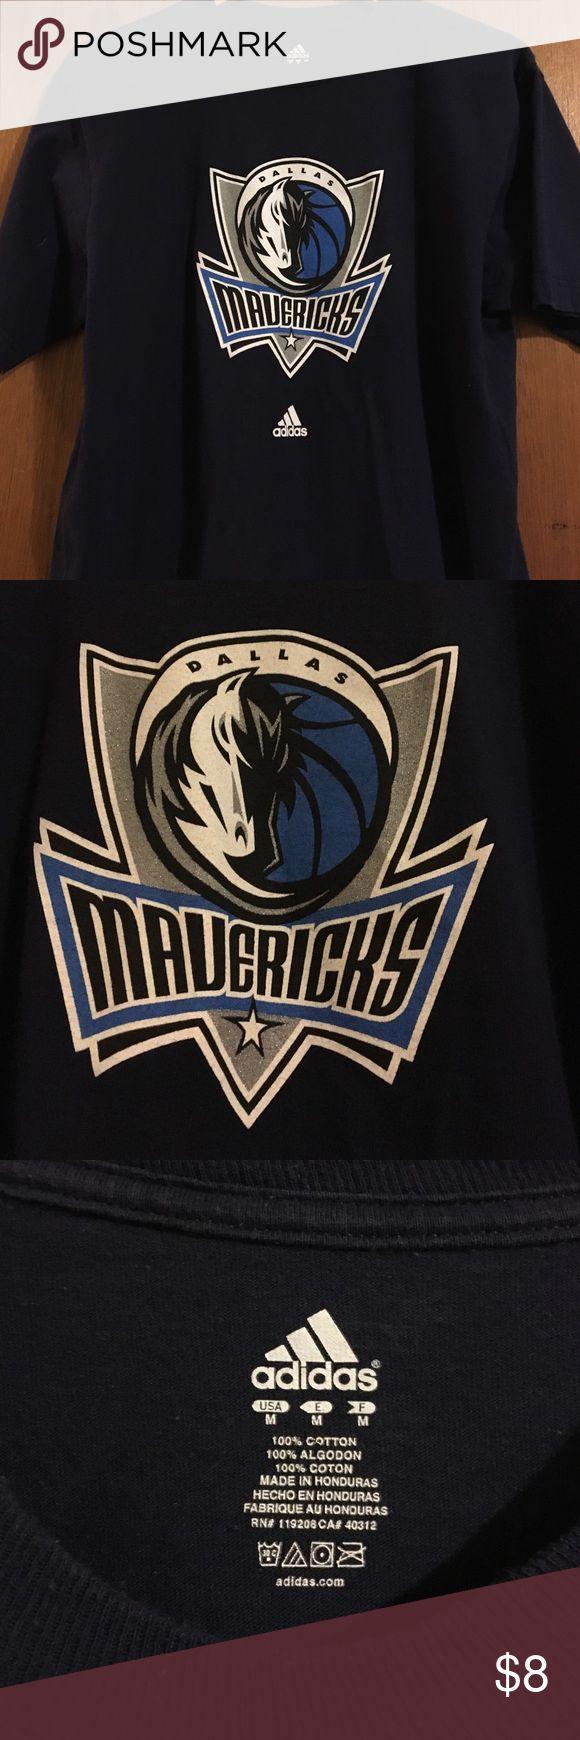 Dallas Mavericks tshirt Blue shirt sleeve Adidas tshirt with Dallas Mavericks logo Adidas Shirts Tees - Short Sleeve